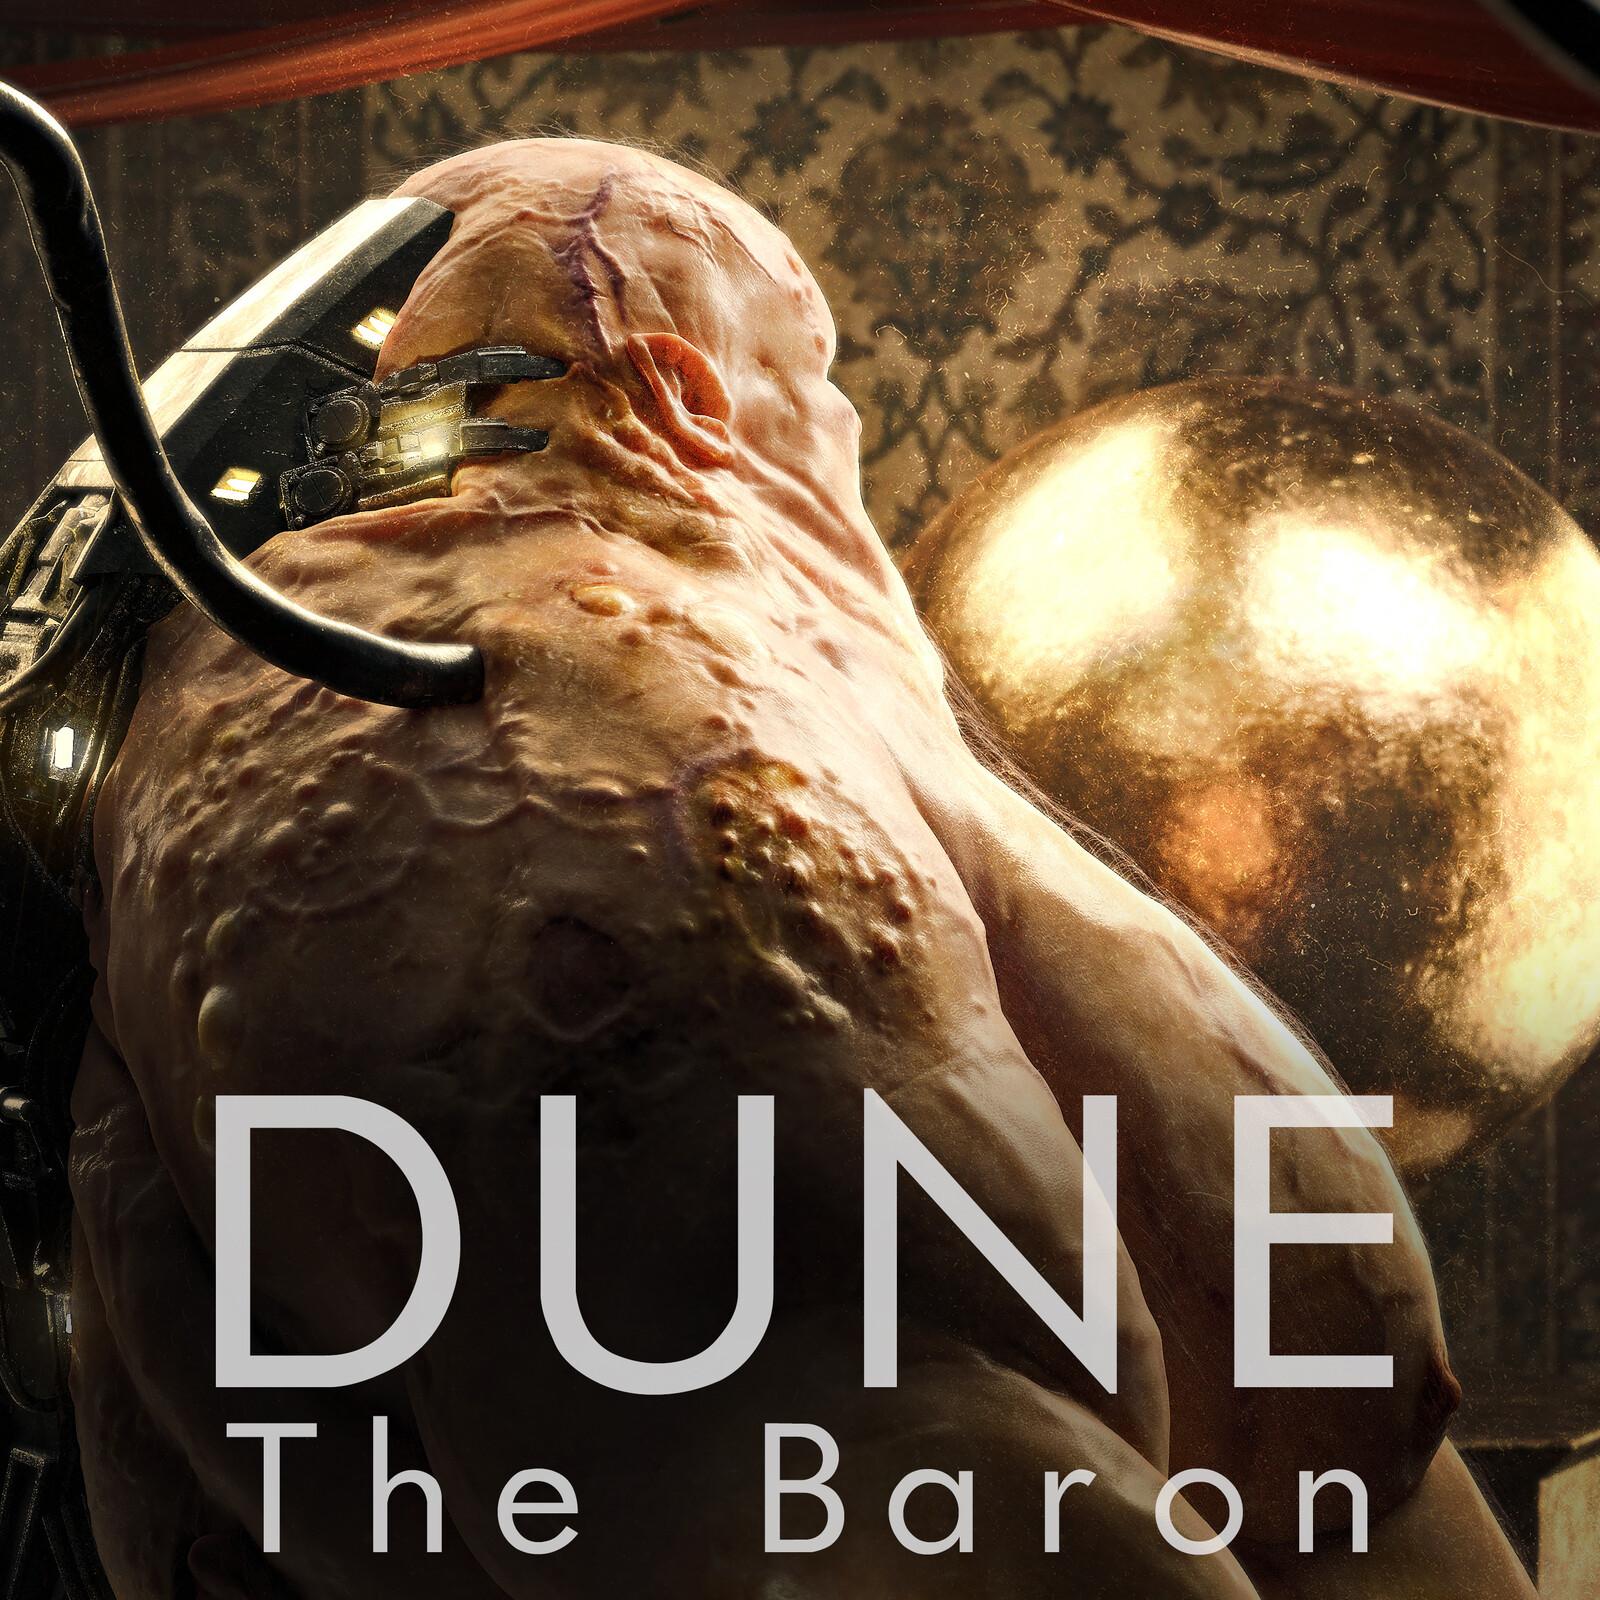 DUNE The Baron - Fan Art creation with Zbrush, Maya, Arnold, Mari and Xgen